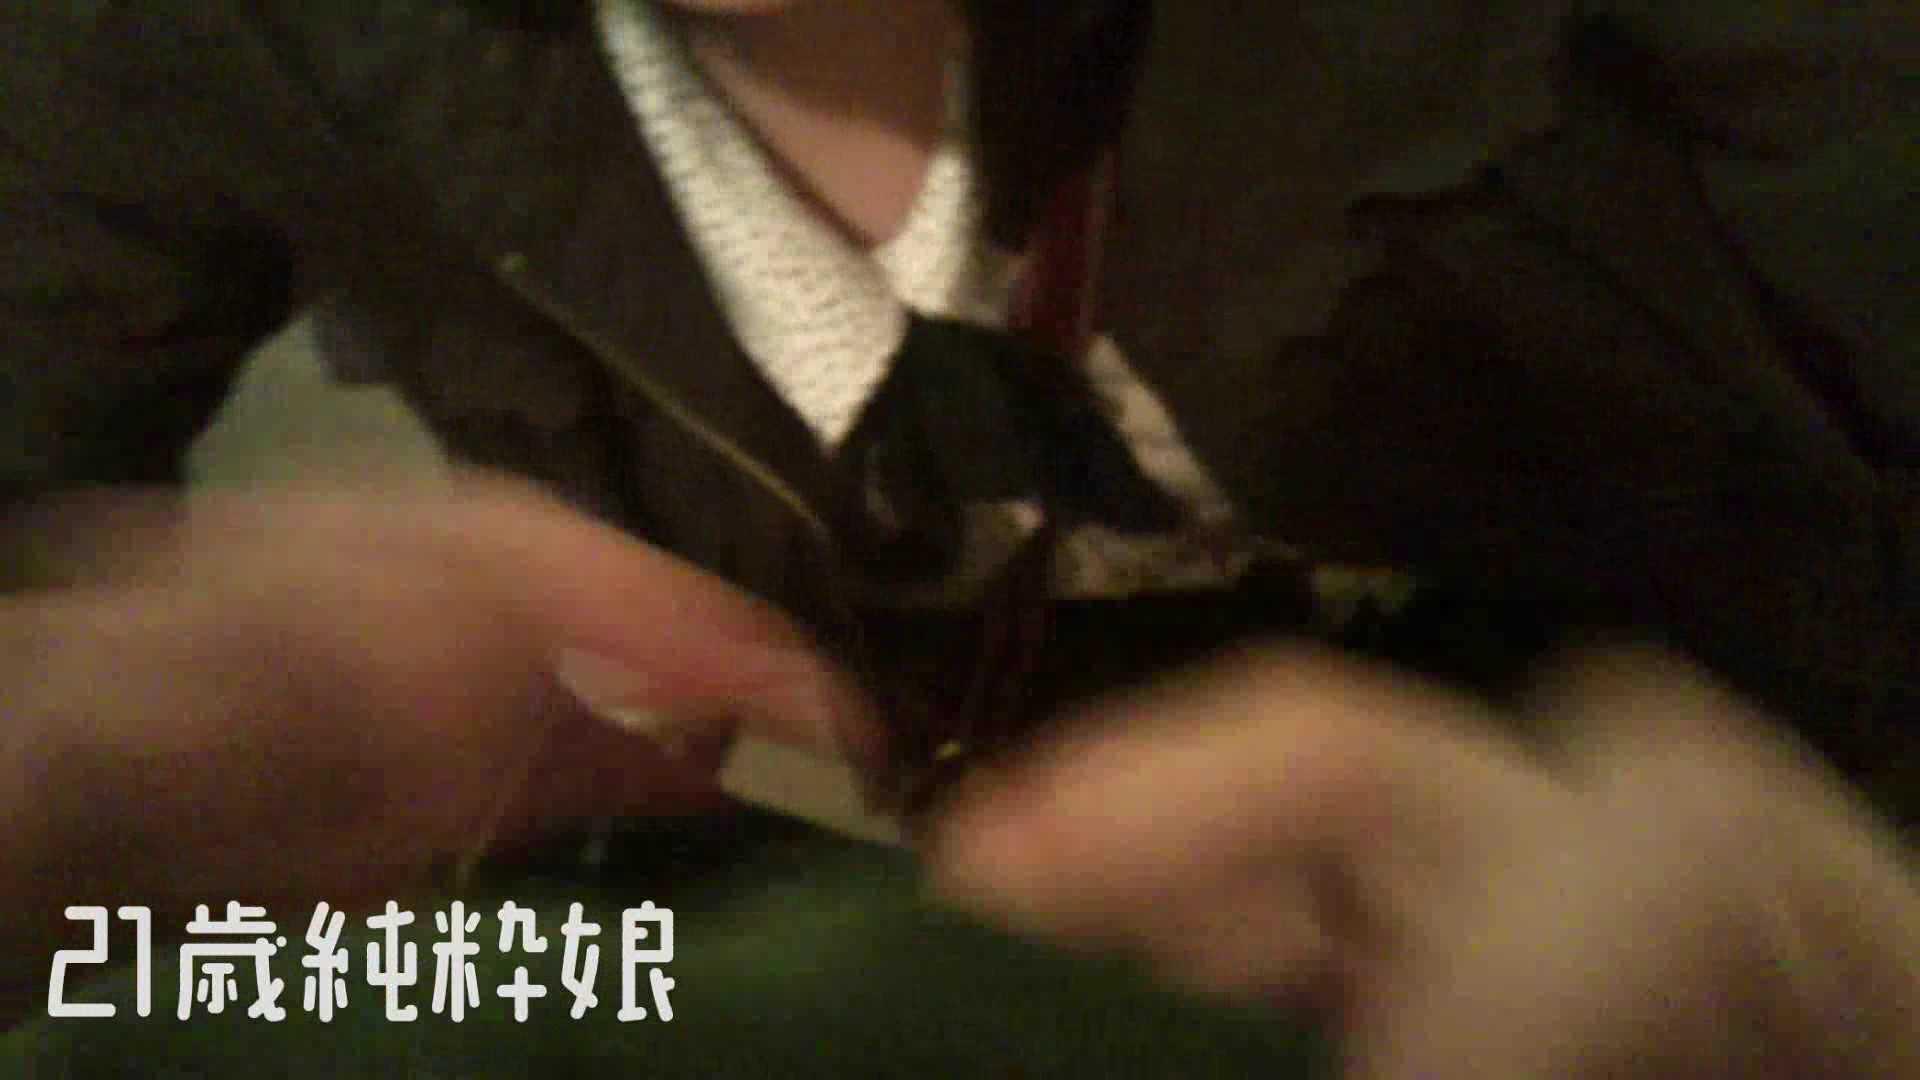 Gカップ21歳純粋嬢第2弾Vol.5 OLヌード天国 | 学校  110PIX 33